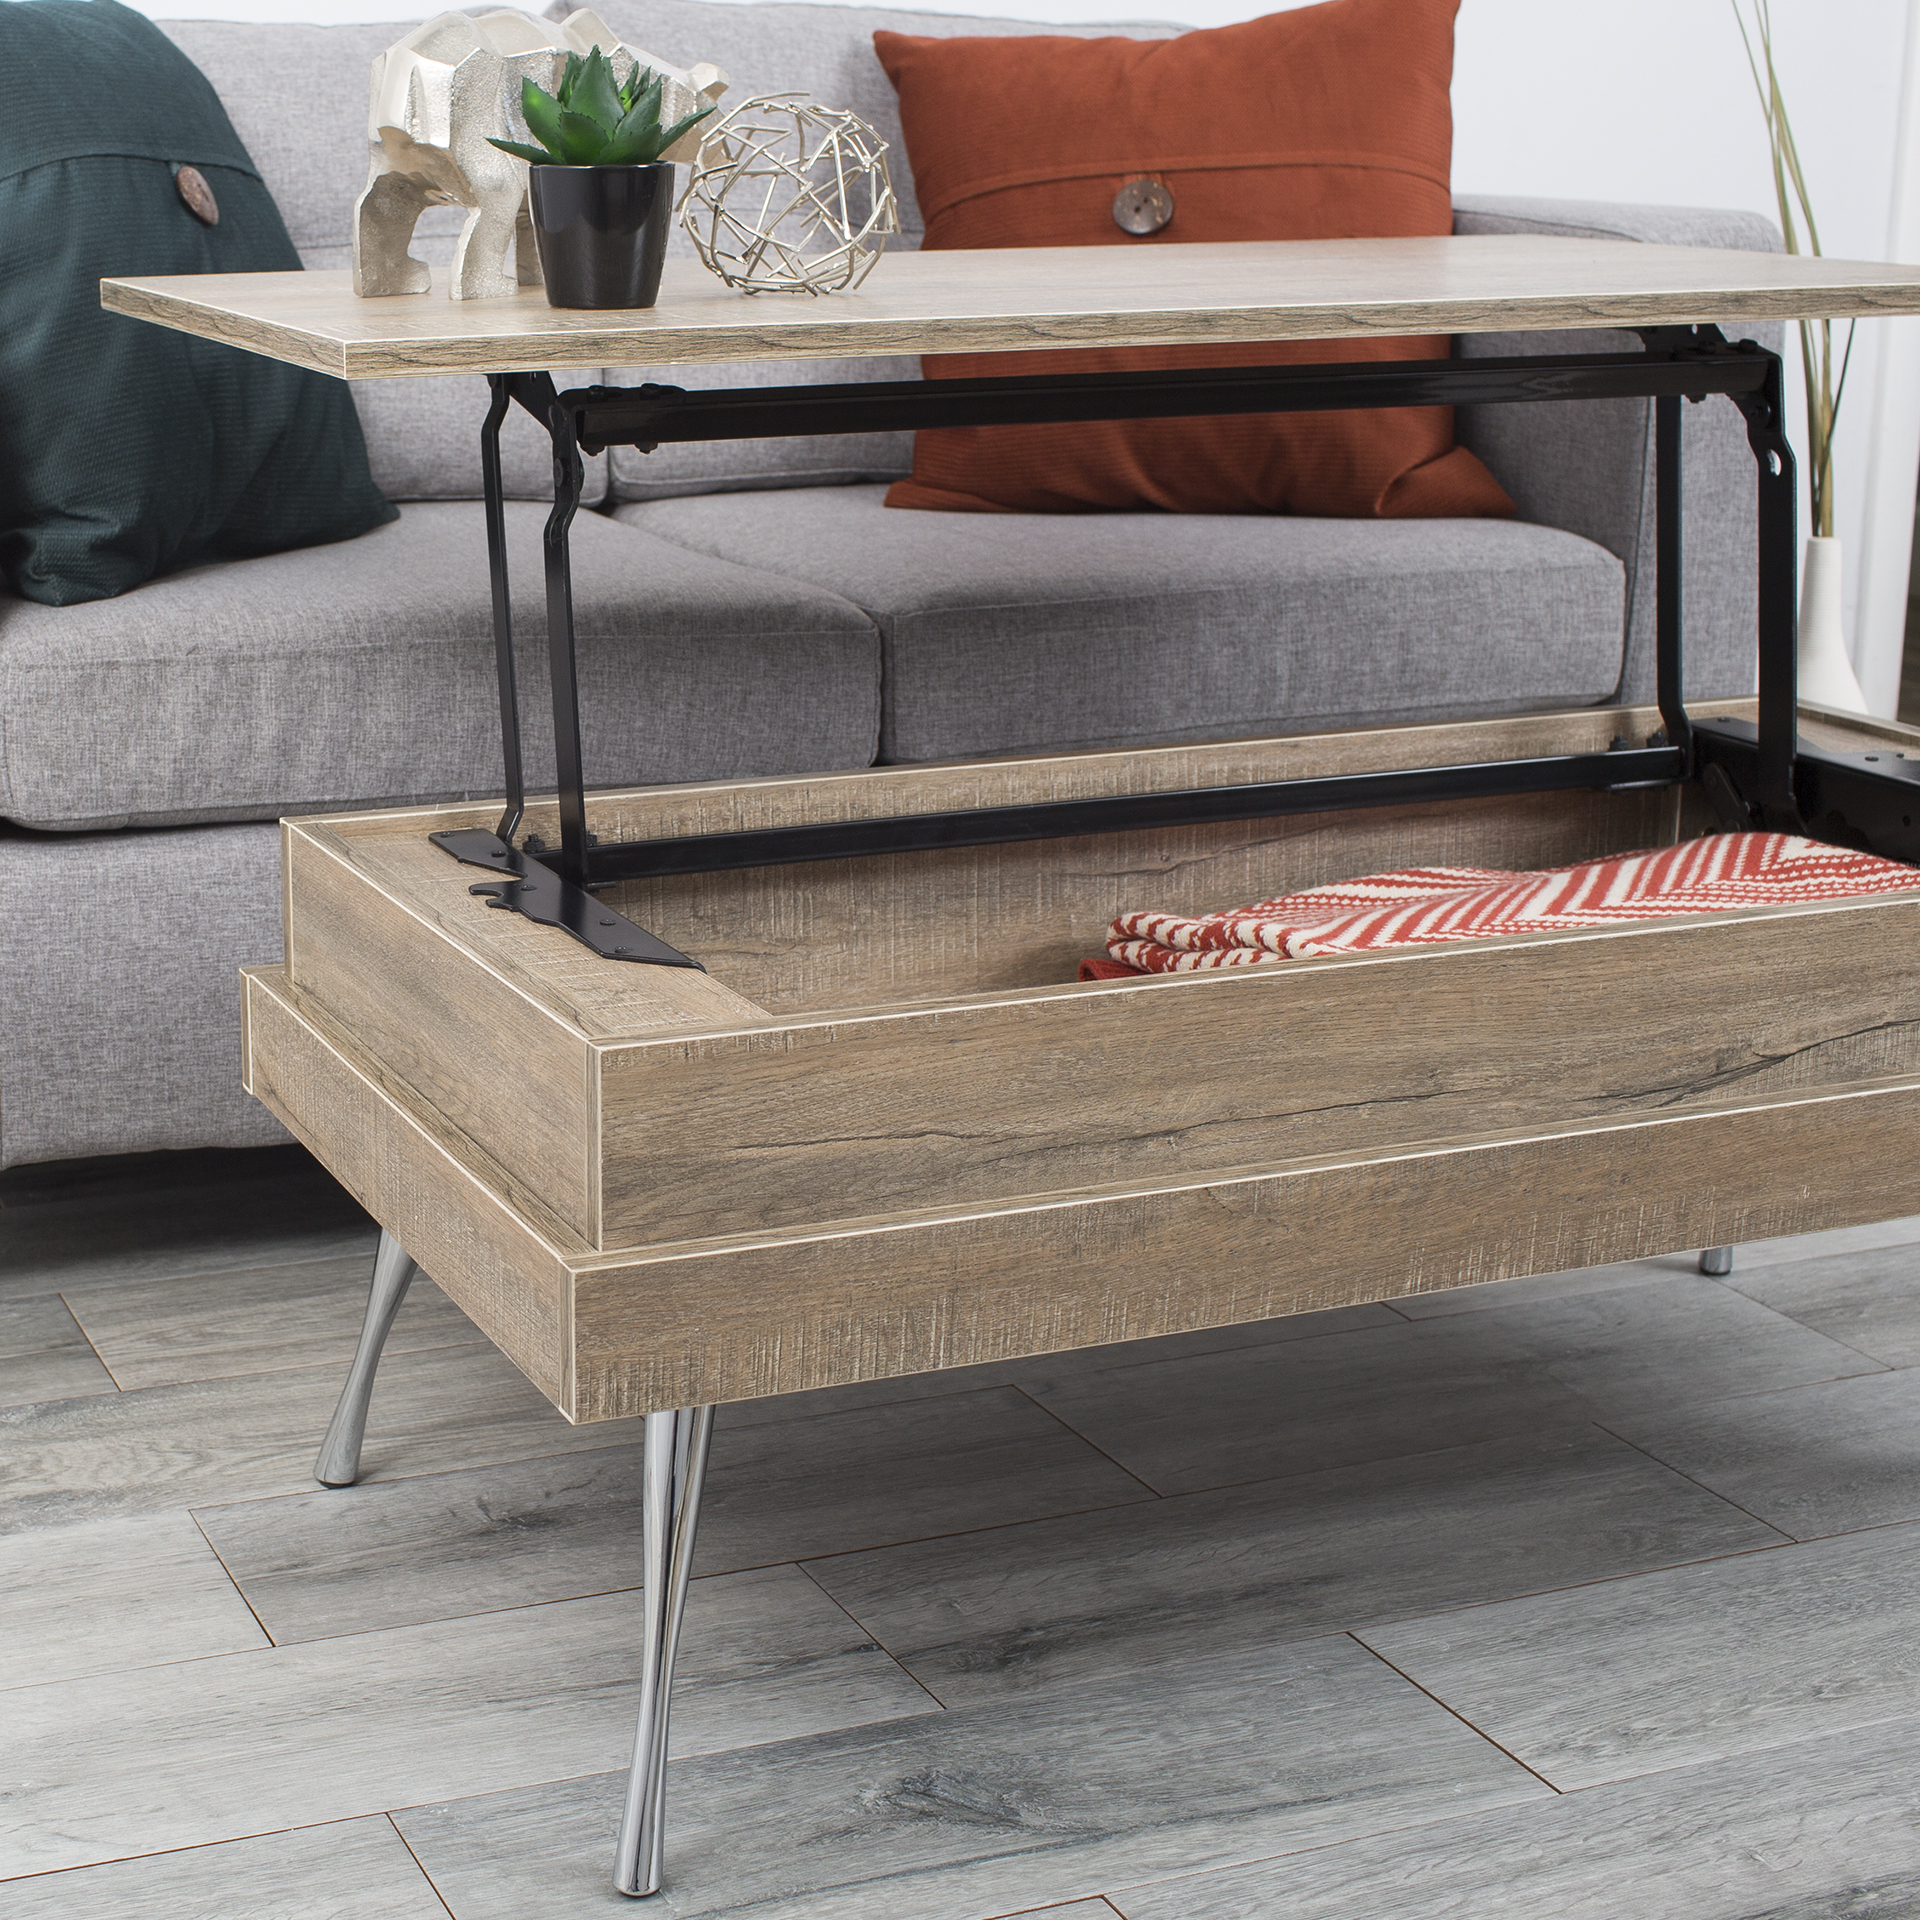 Koryo Lift Top Faux Wood Laminate With Chrome Legs Coffee Table